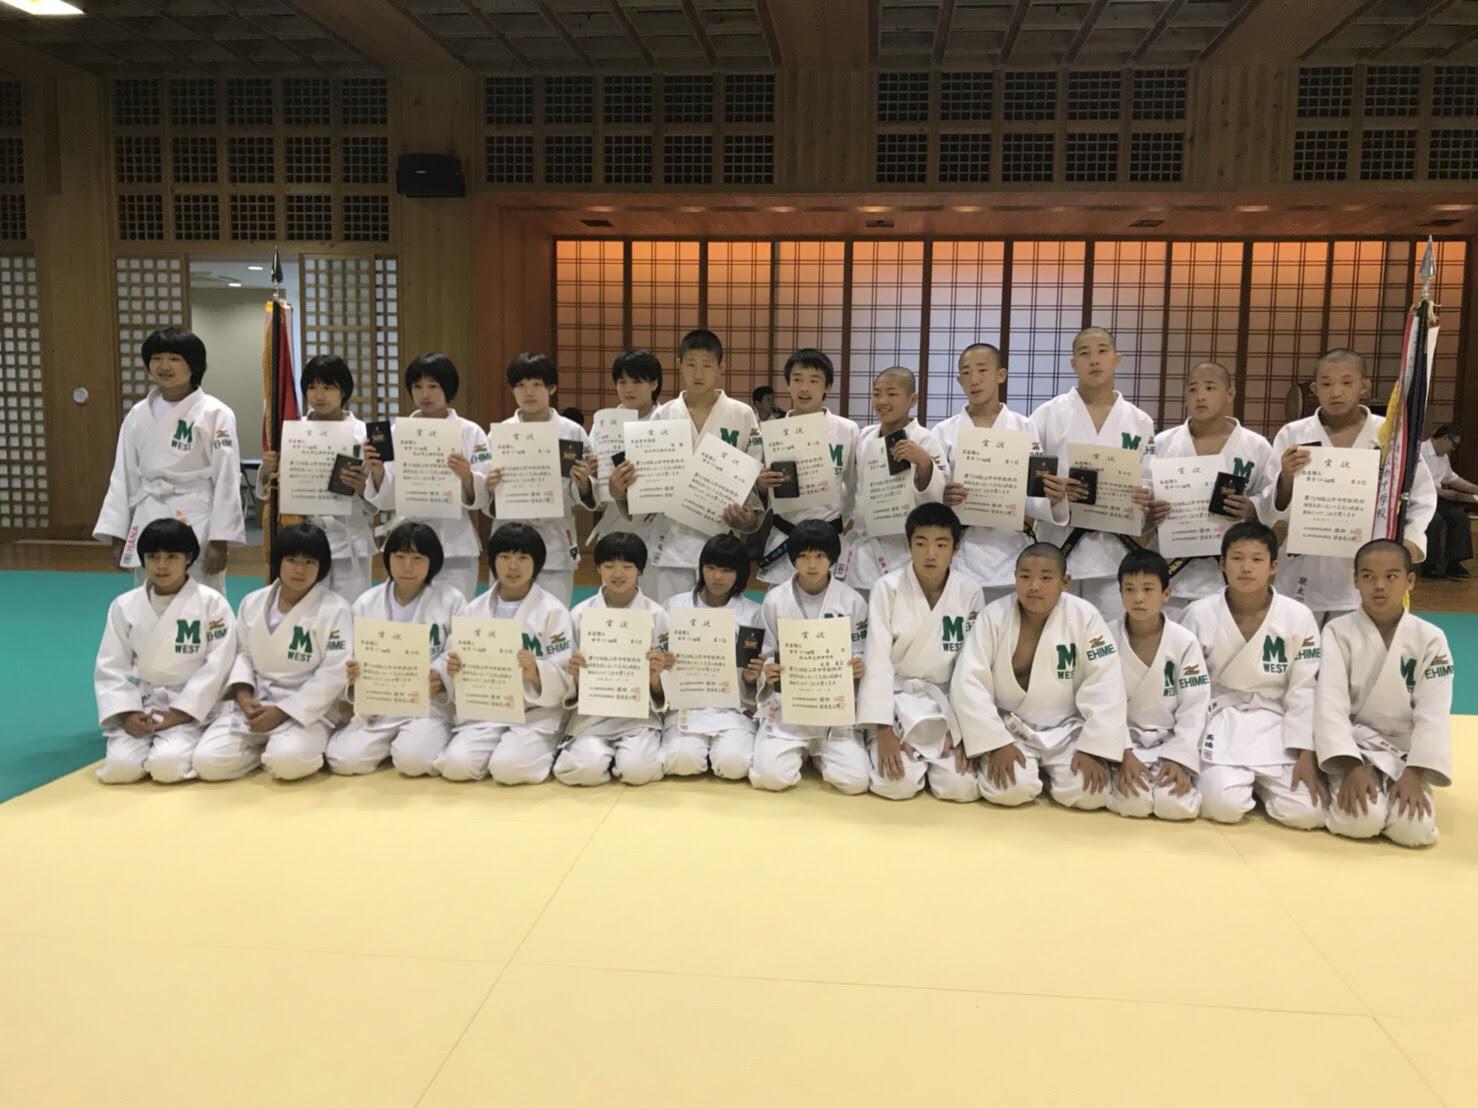 judou.jpg